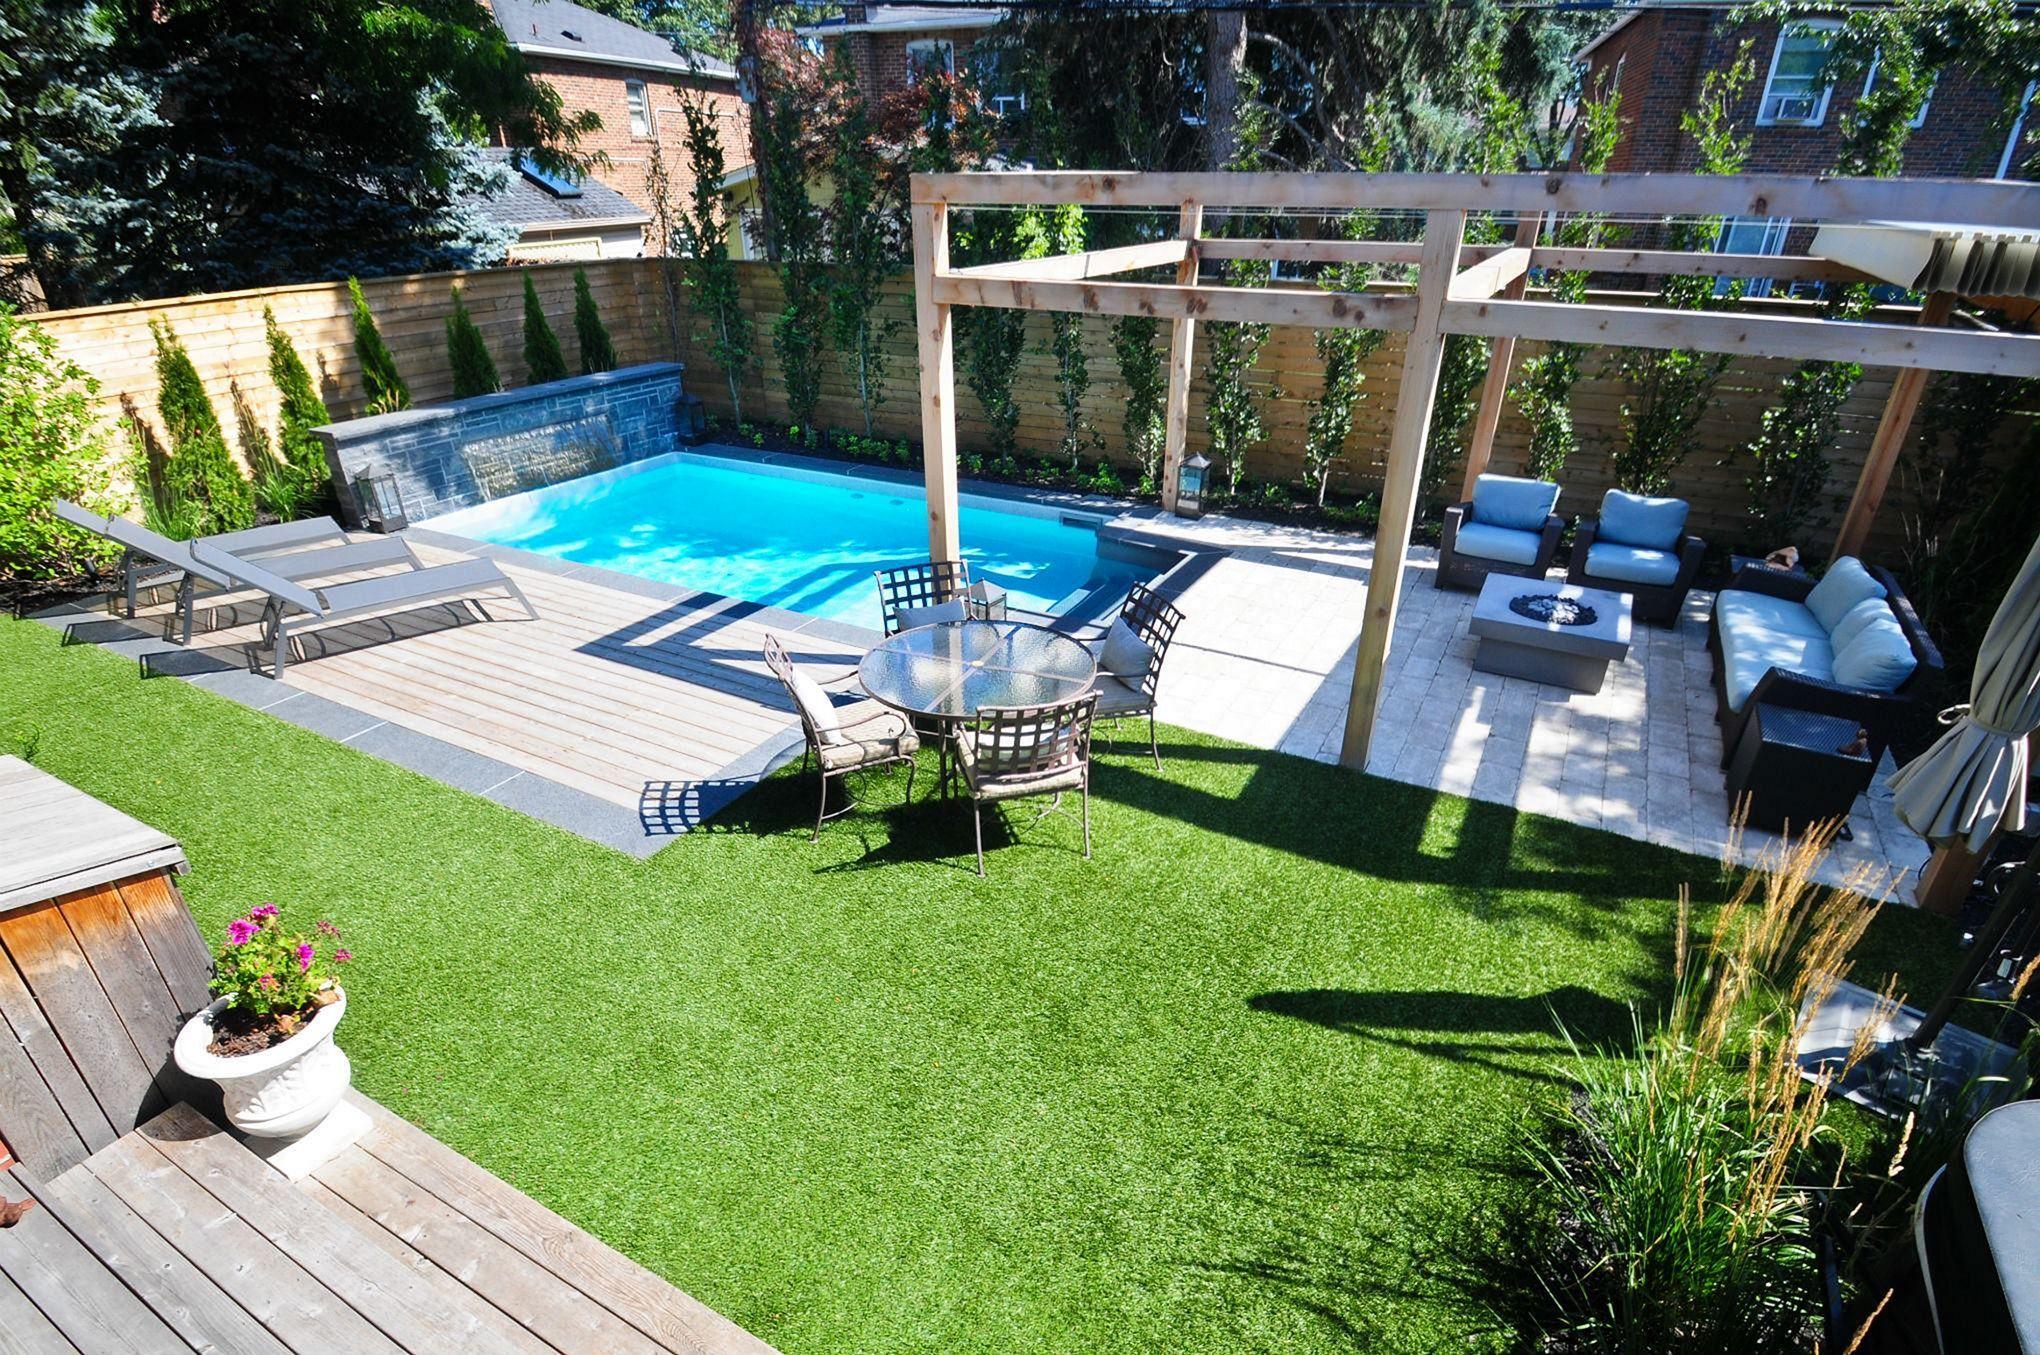 Backyard Design Ideas Without Pool